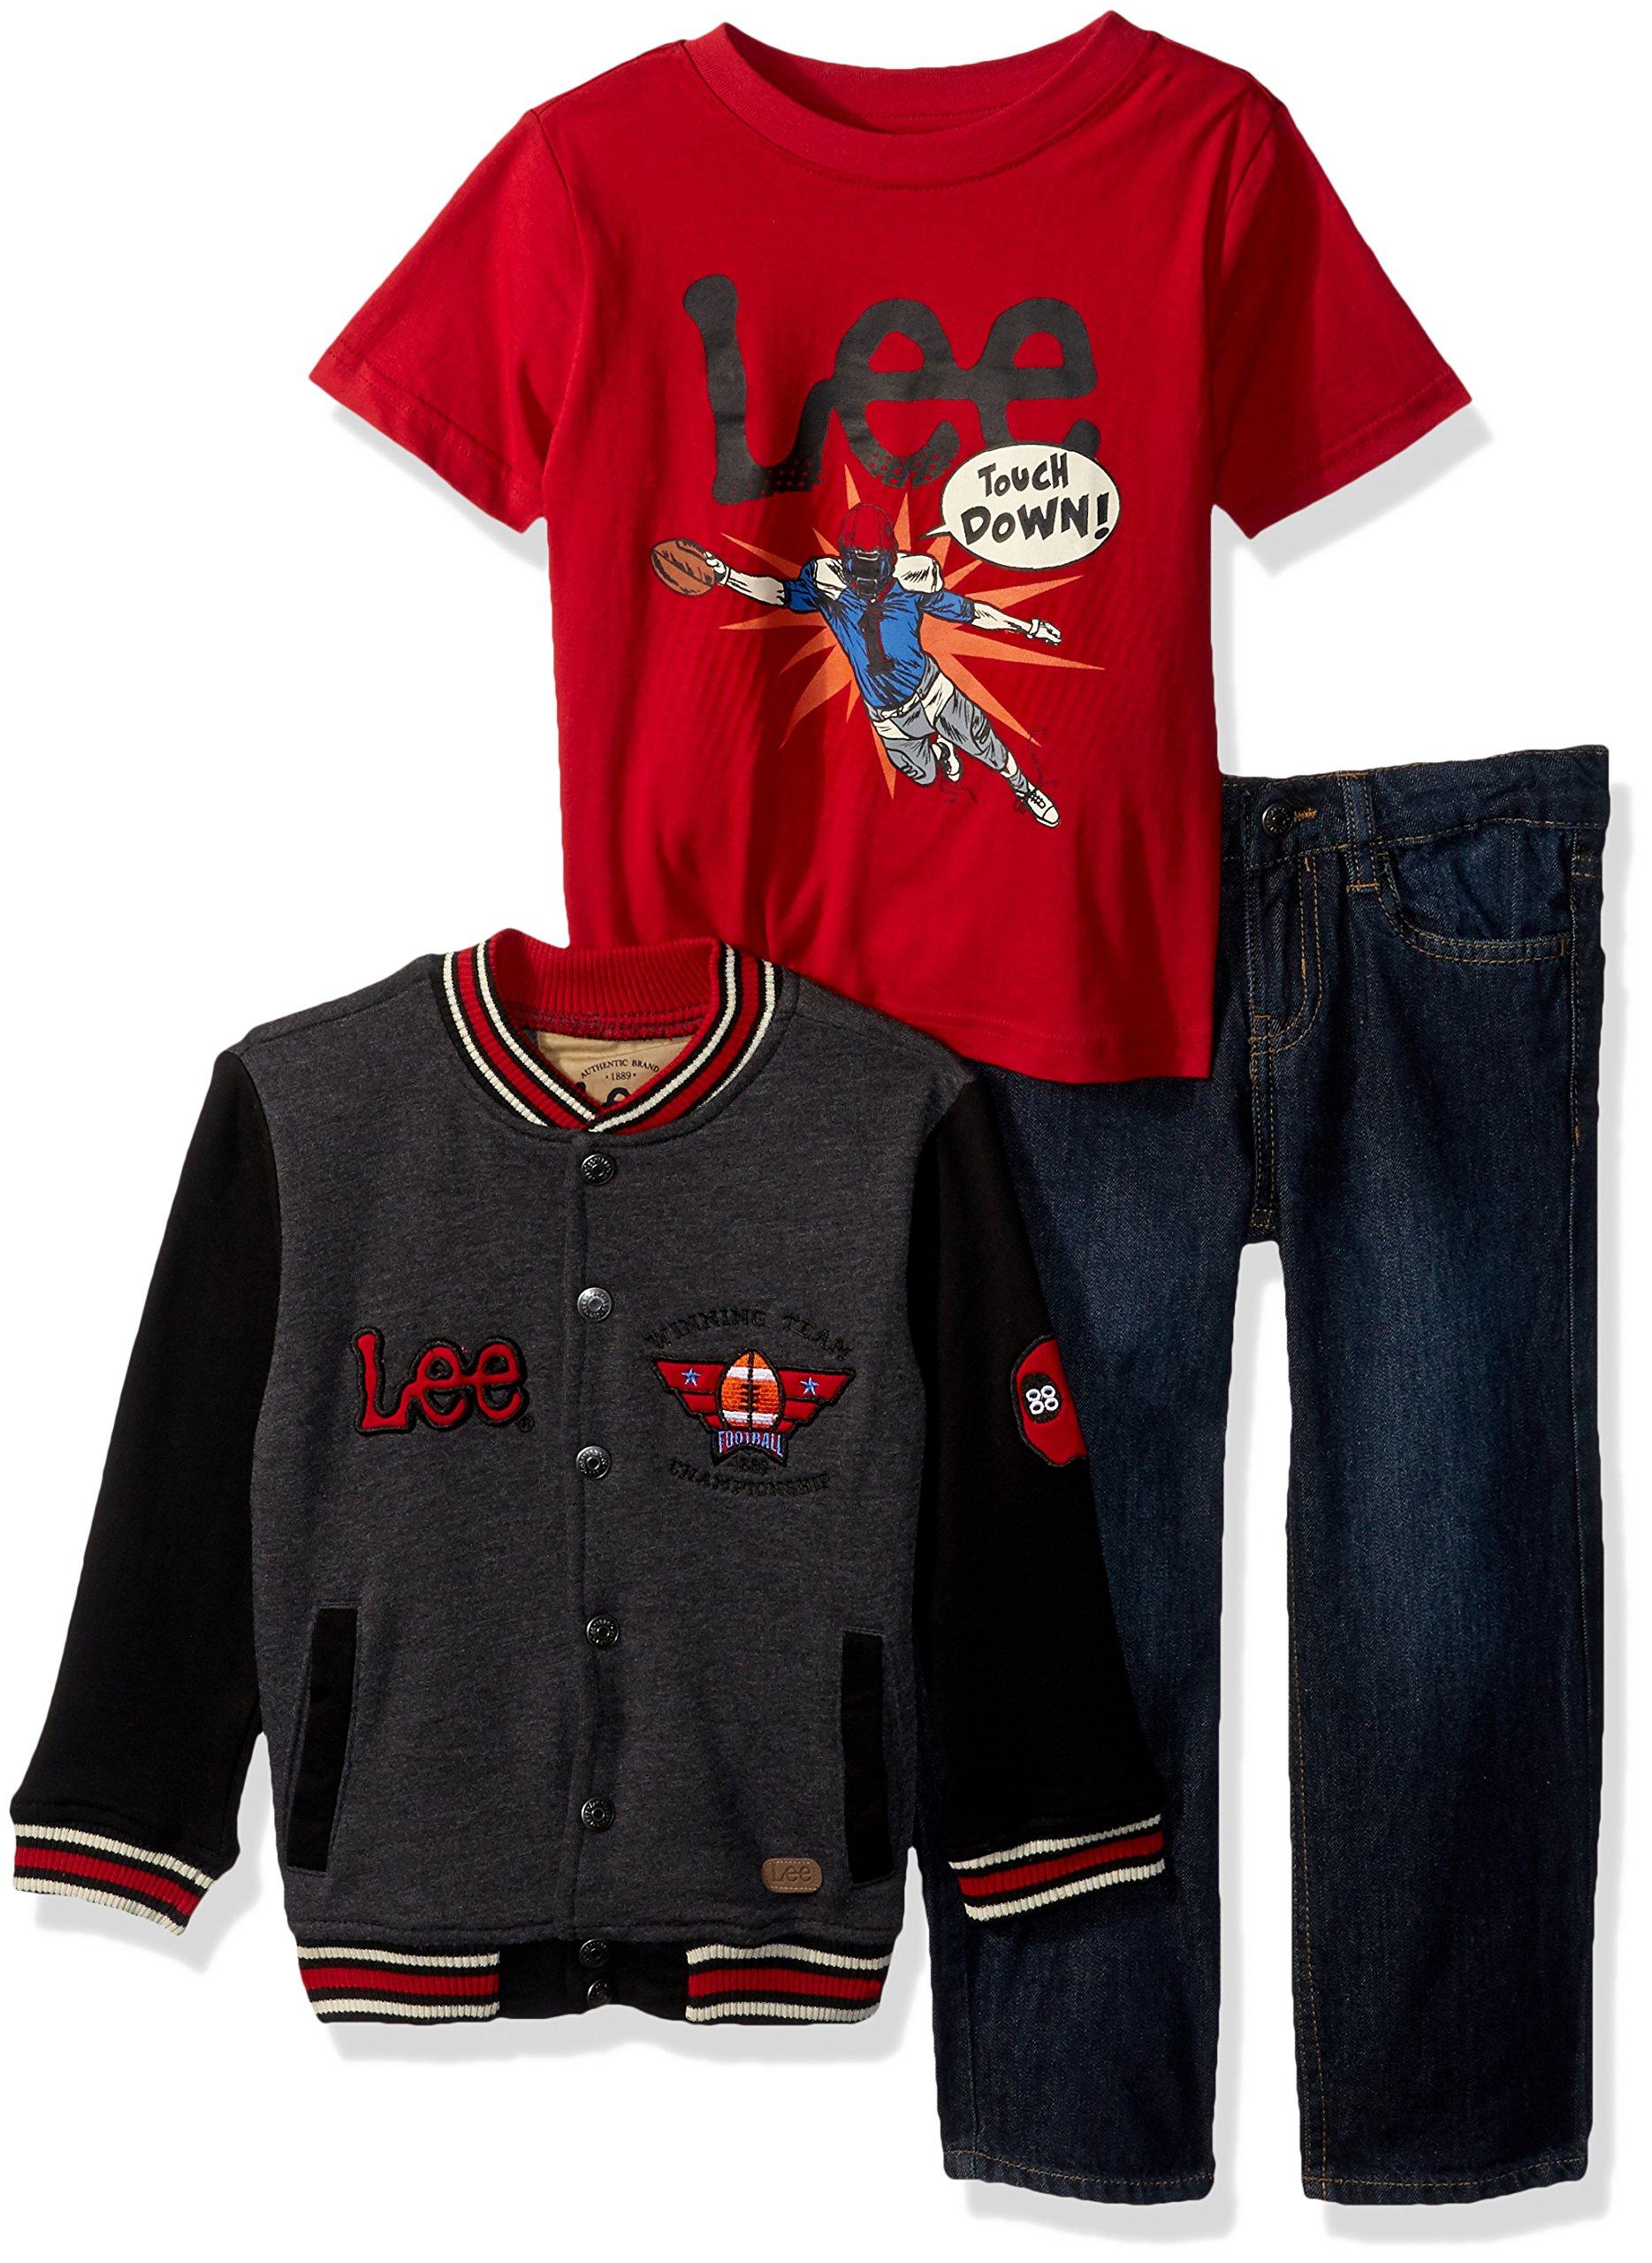 LEE Boys' Little Pants, Tee, Jacket Set, Touch Down